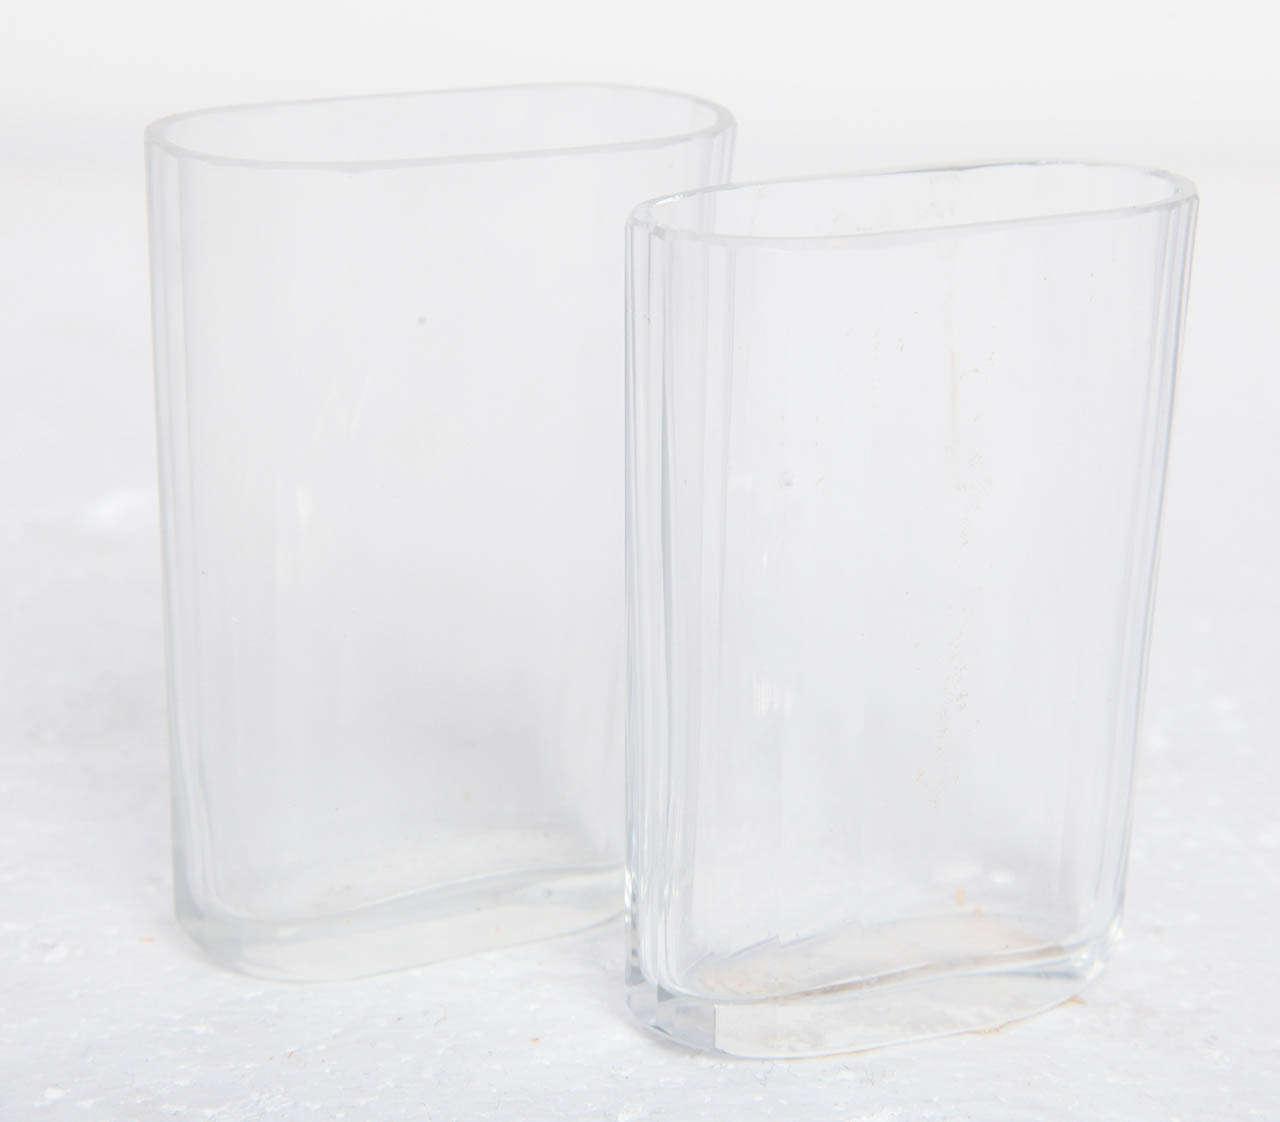 20th Century Spa , Glassware and Utensil Set For Sale